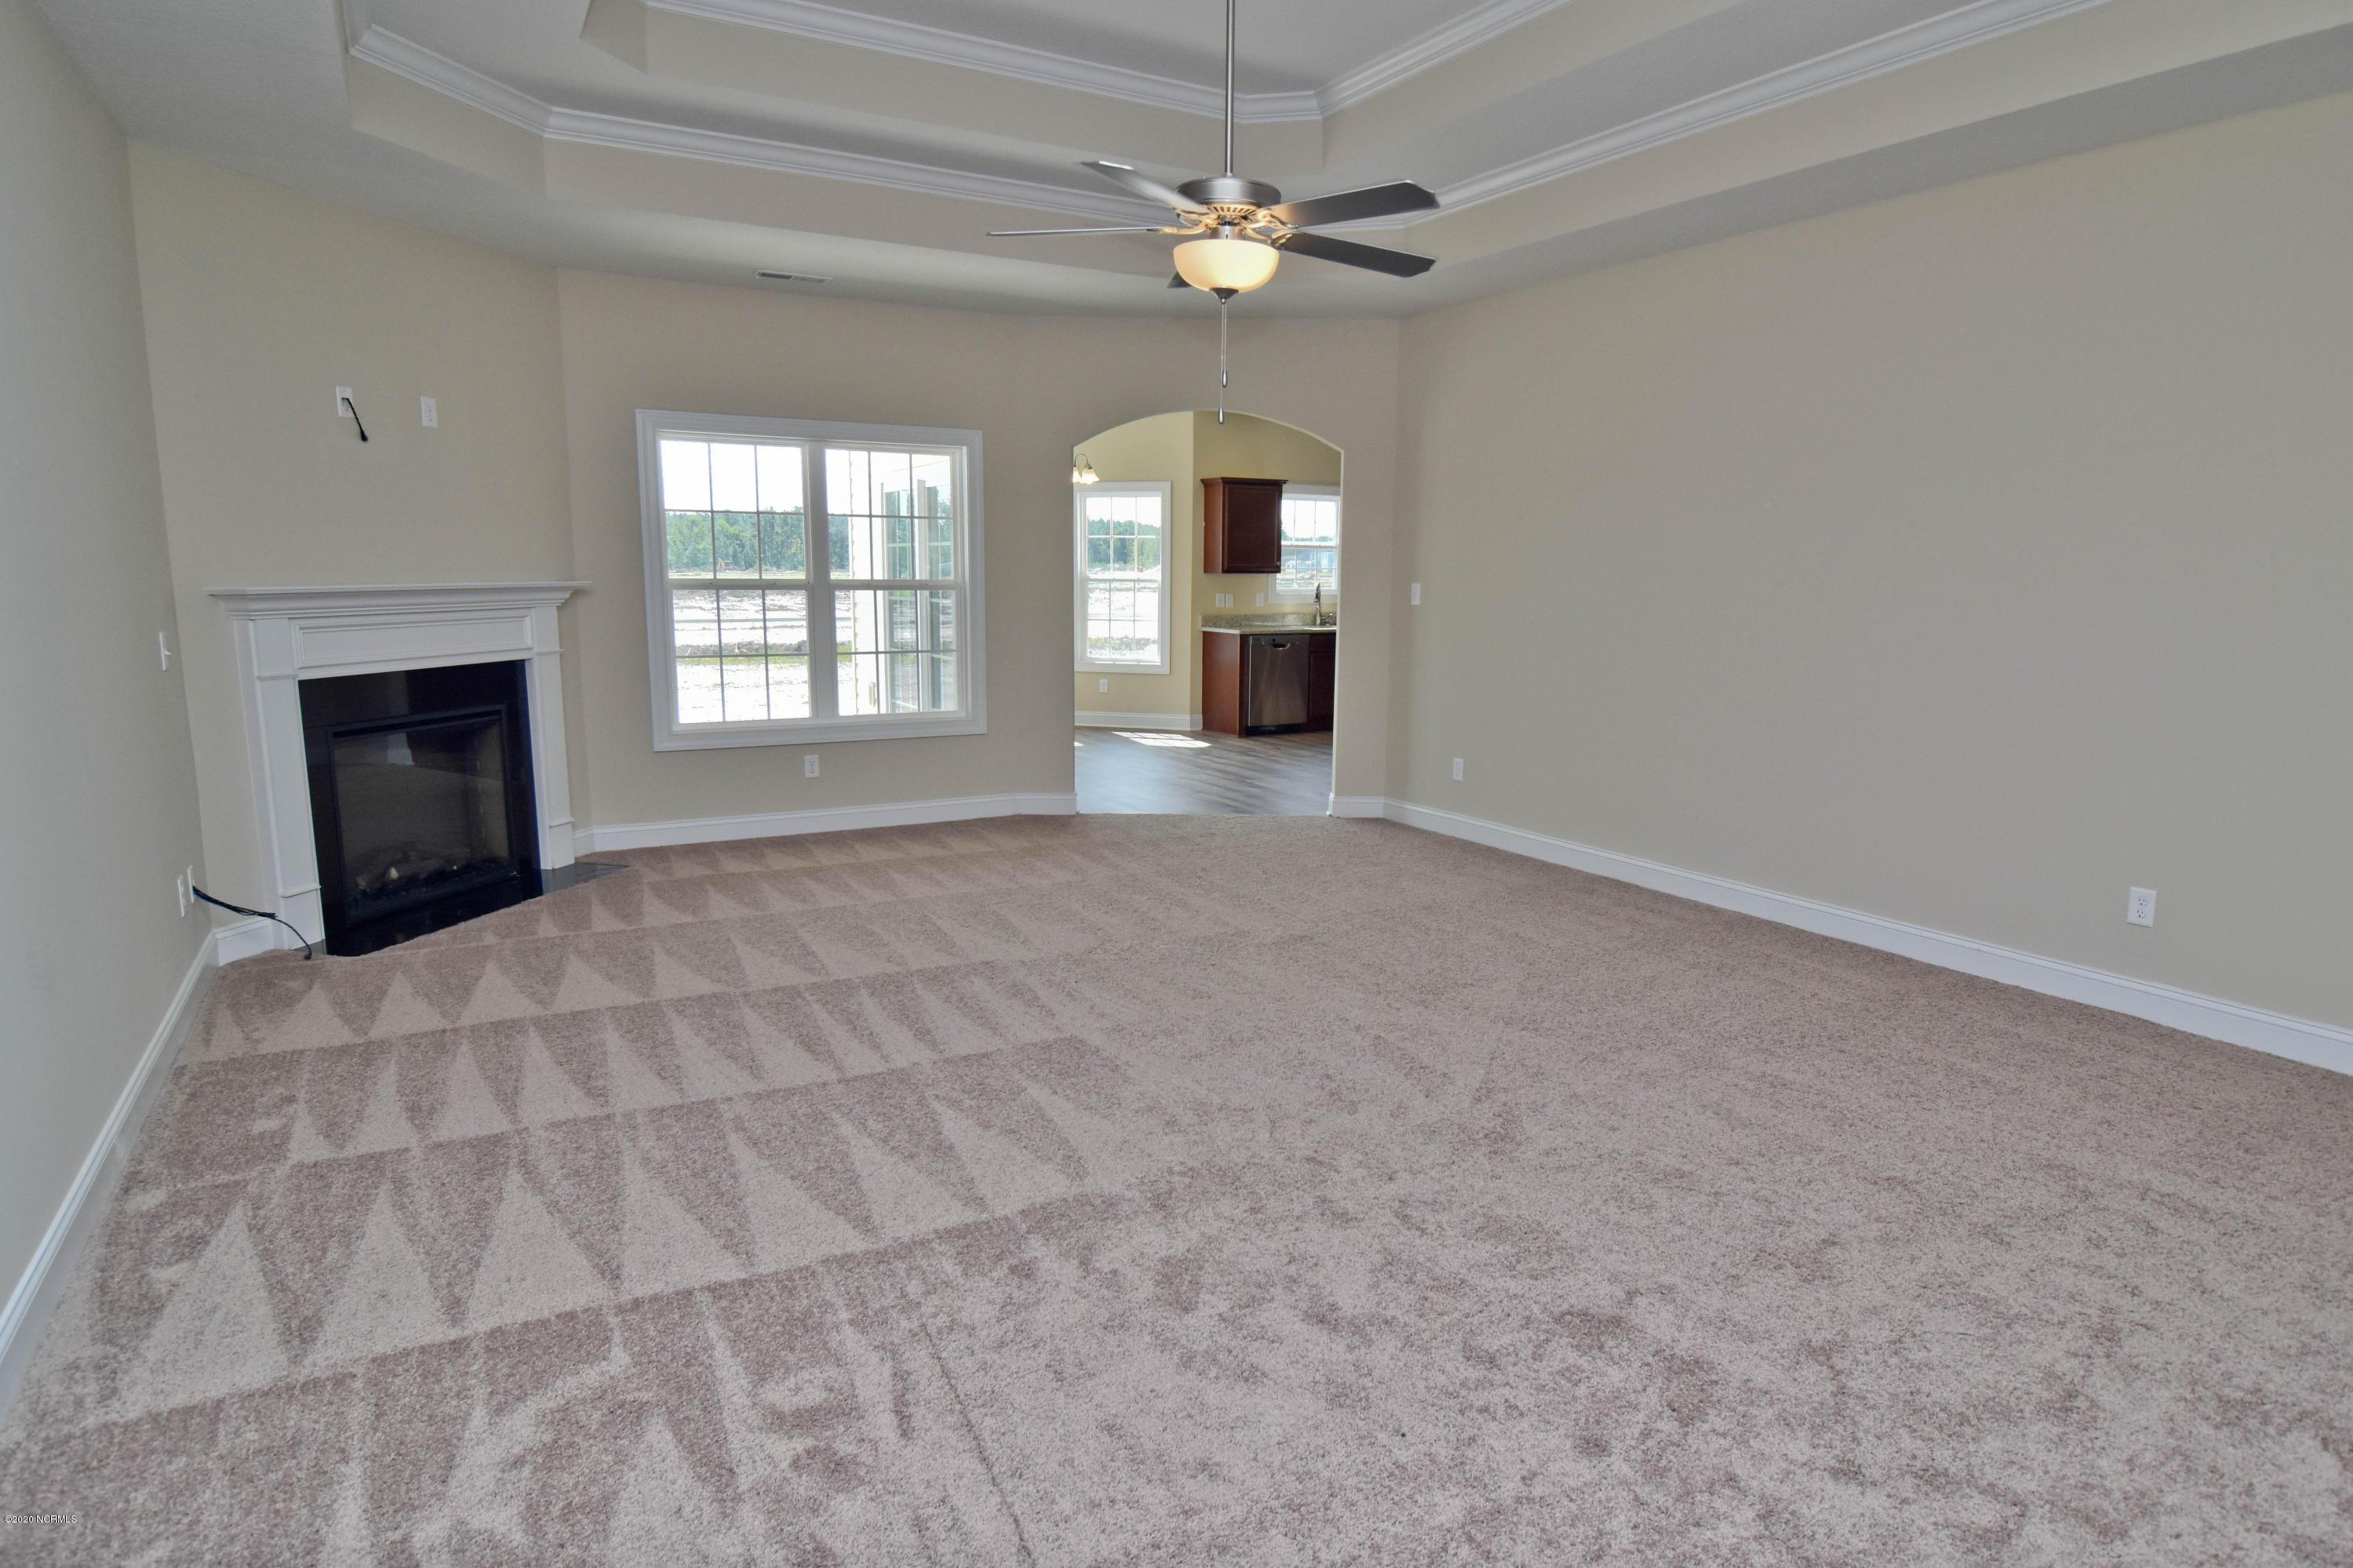 710 Hope Dexter Drive, Jacksonville, North Carolina 28546, 3 Bedrooms Bedrooms, 7 Rooms Rooms,2 BathroomsBathrooms,Single family residence,For sale,Hope Dexter,100189724